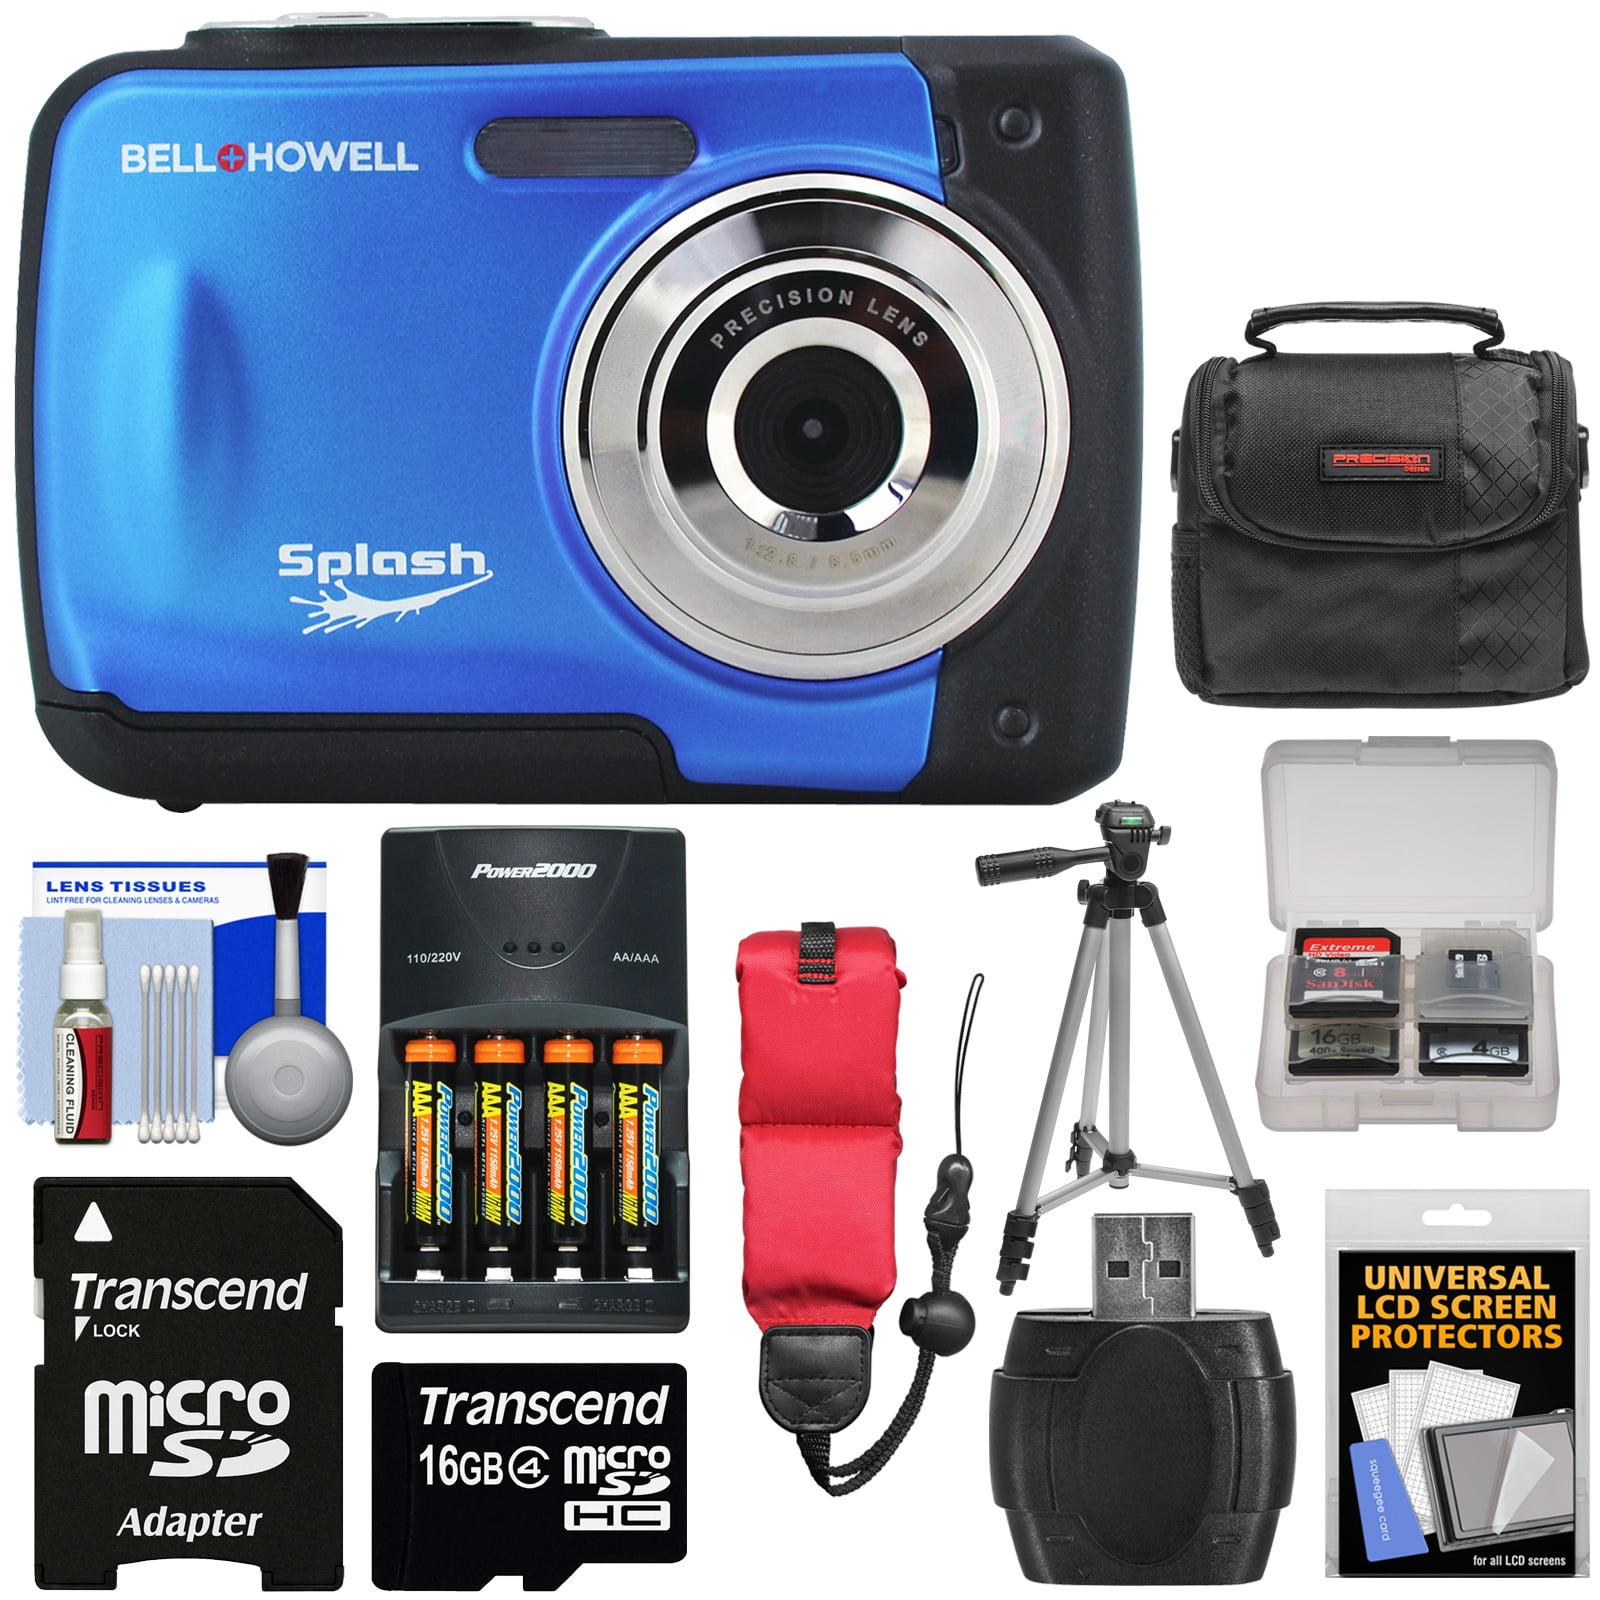 Bell & Howell Splash WP10 Shock & Waterproof Digital Camera (Blue) with 16GB Card + Batteries & Charger + Case + Tripod + Floating Strap + Reader + Kit